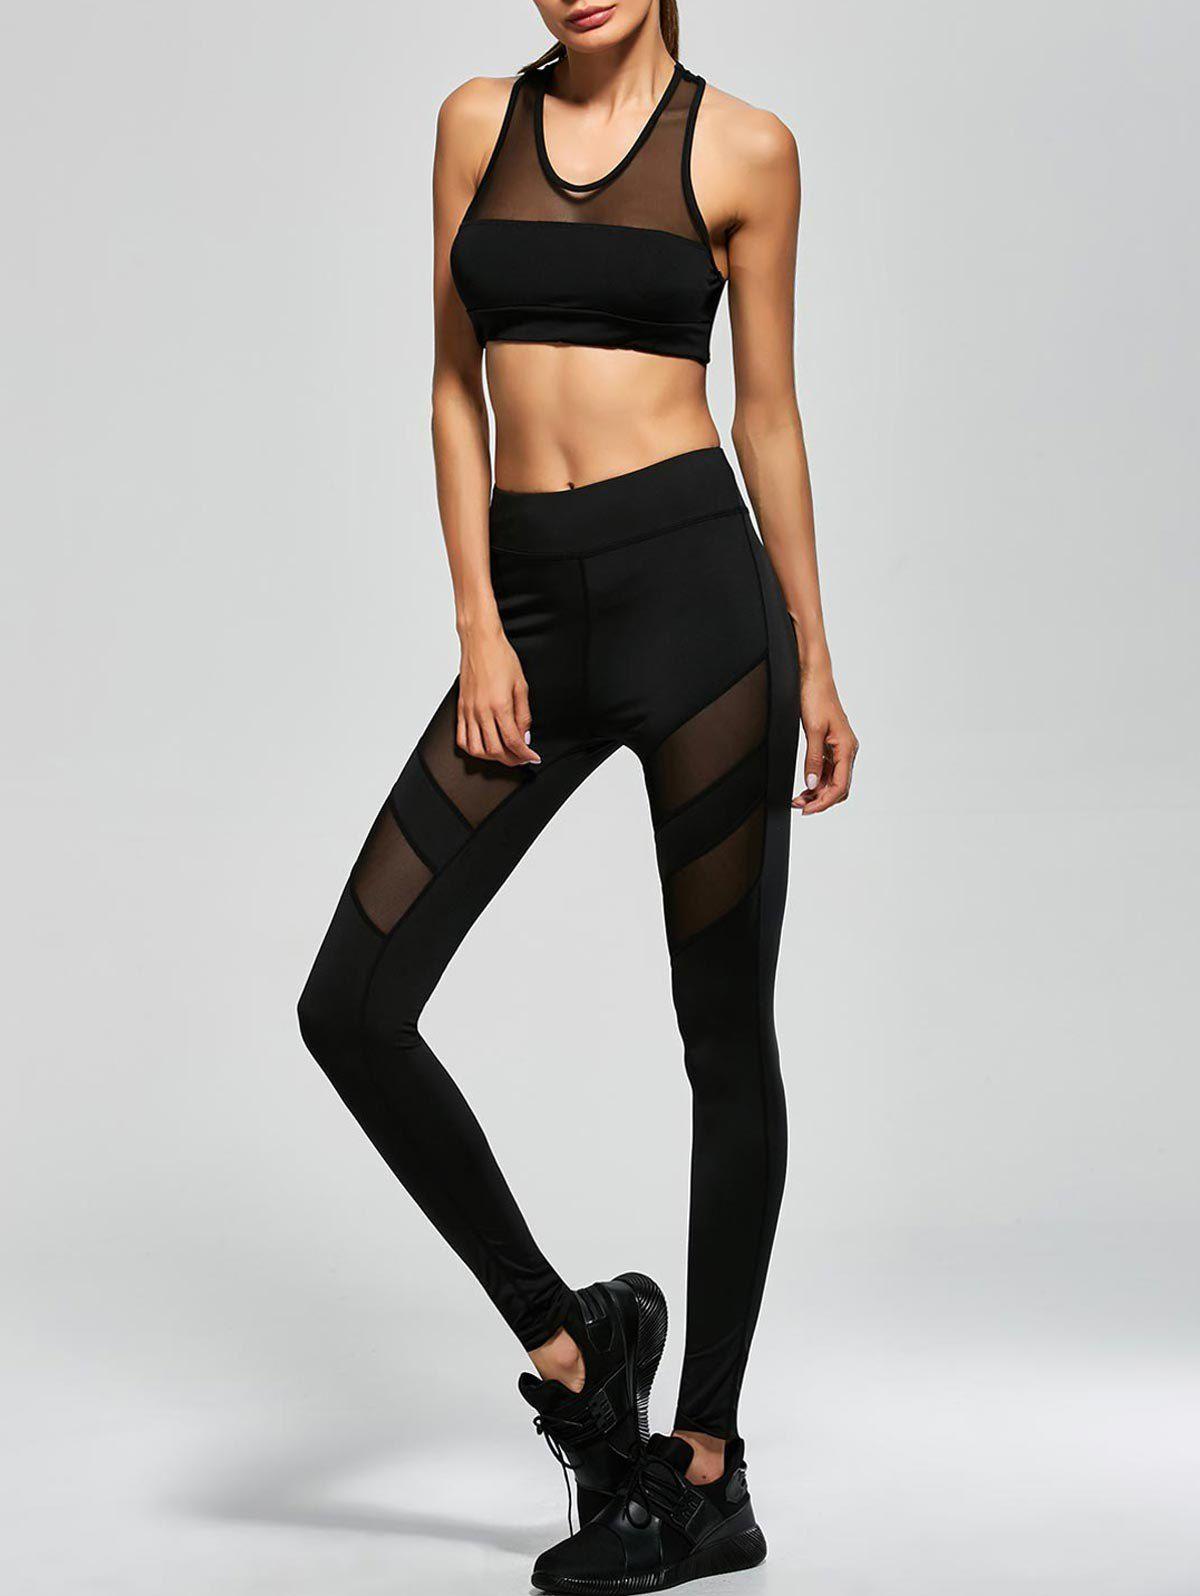 dacc3a34885b $25.49 Mesh Panel Tank Top And Stretch Pants Yoga Suit BLACK: Gym Sets |  ZAFUL